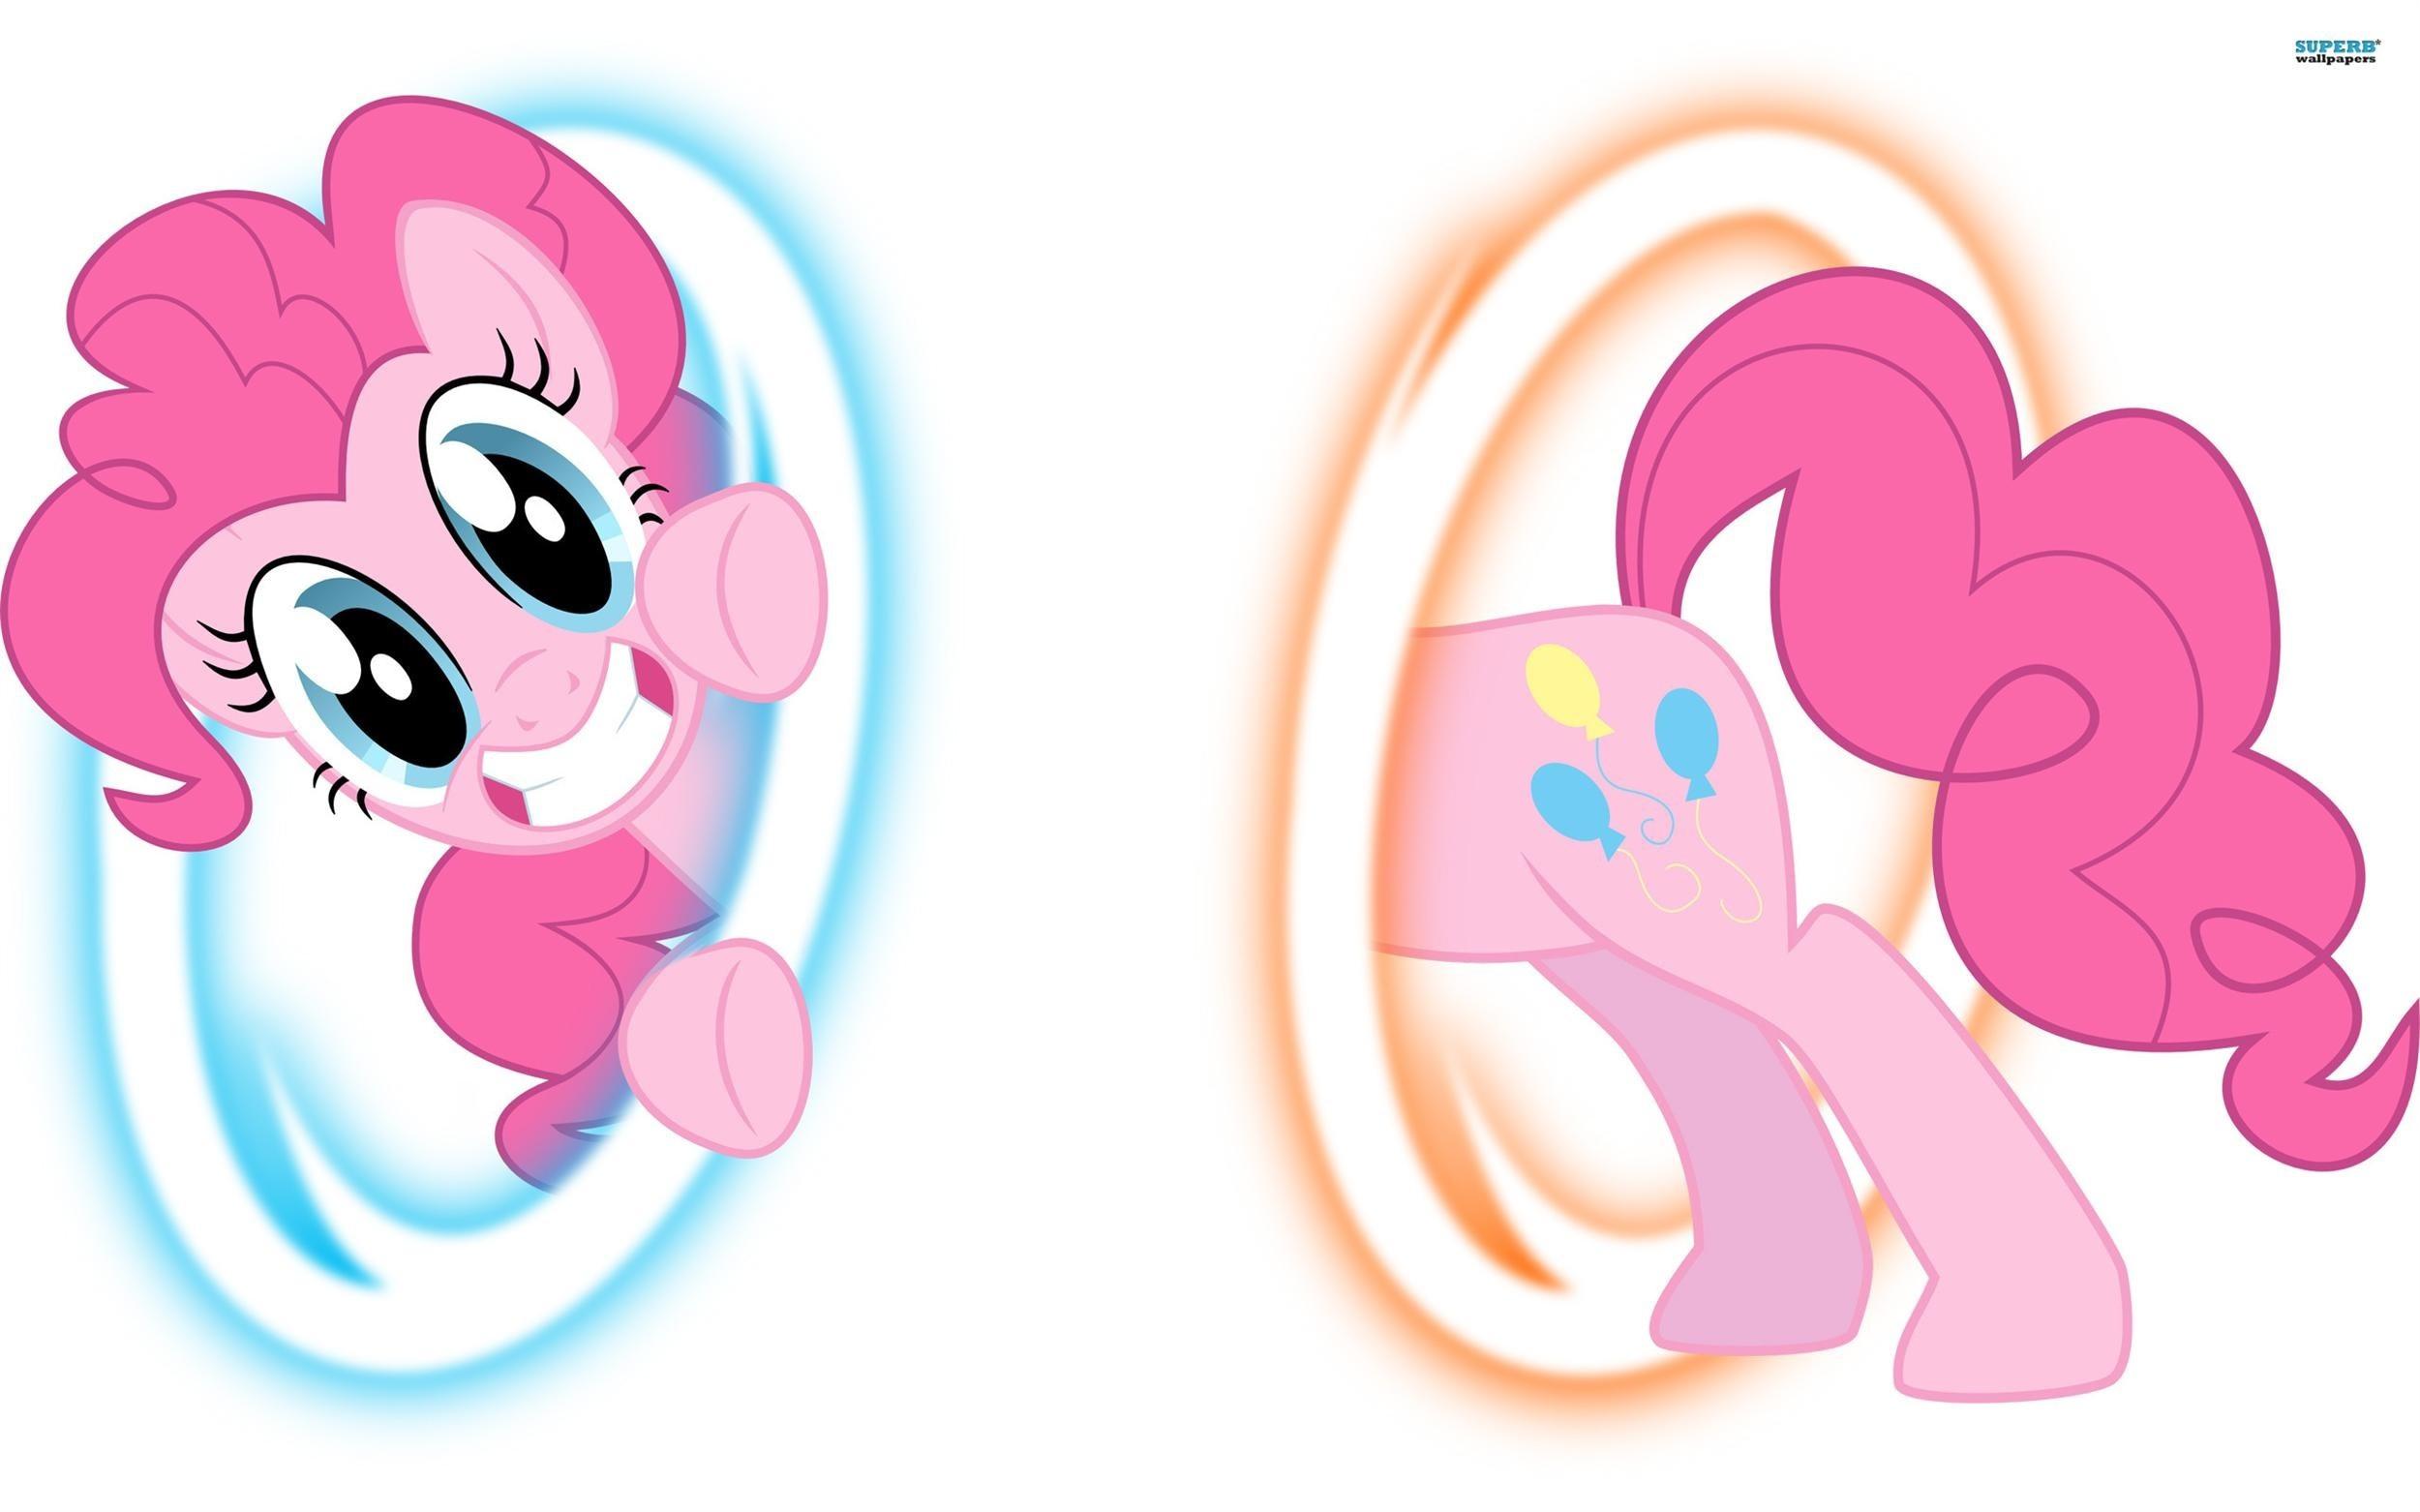 Cool MLP Pics - My Little Pony Friendship is Magic Photo ...